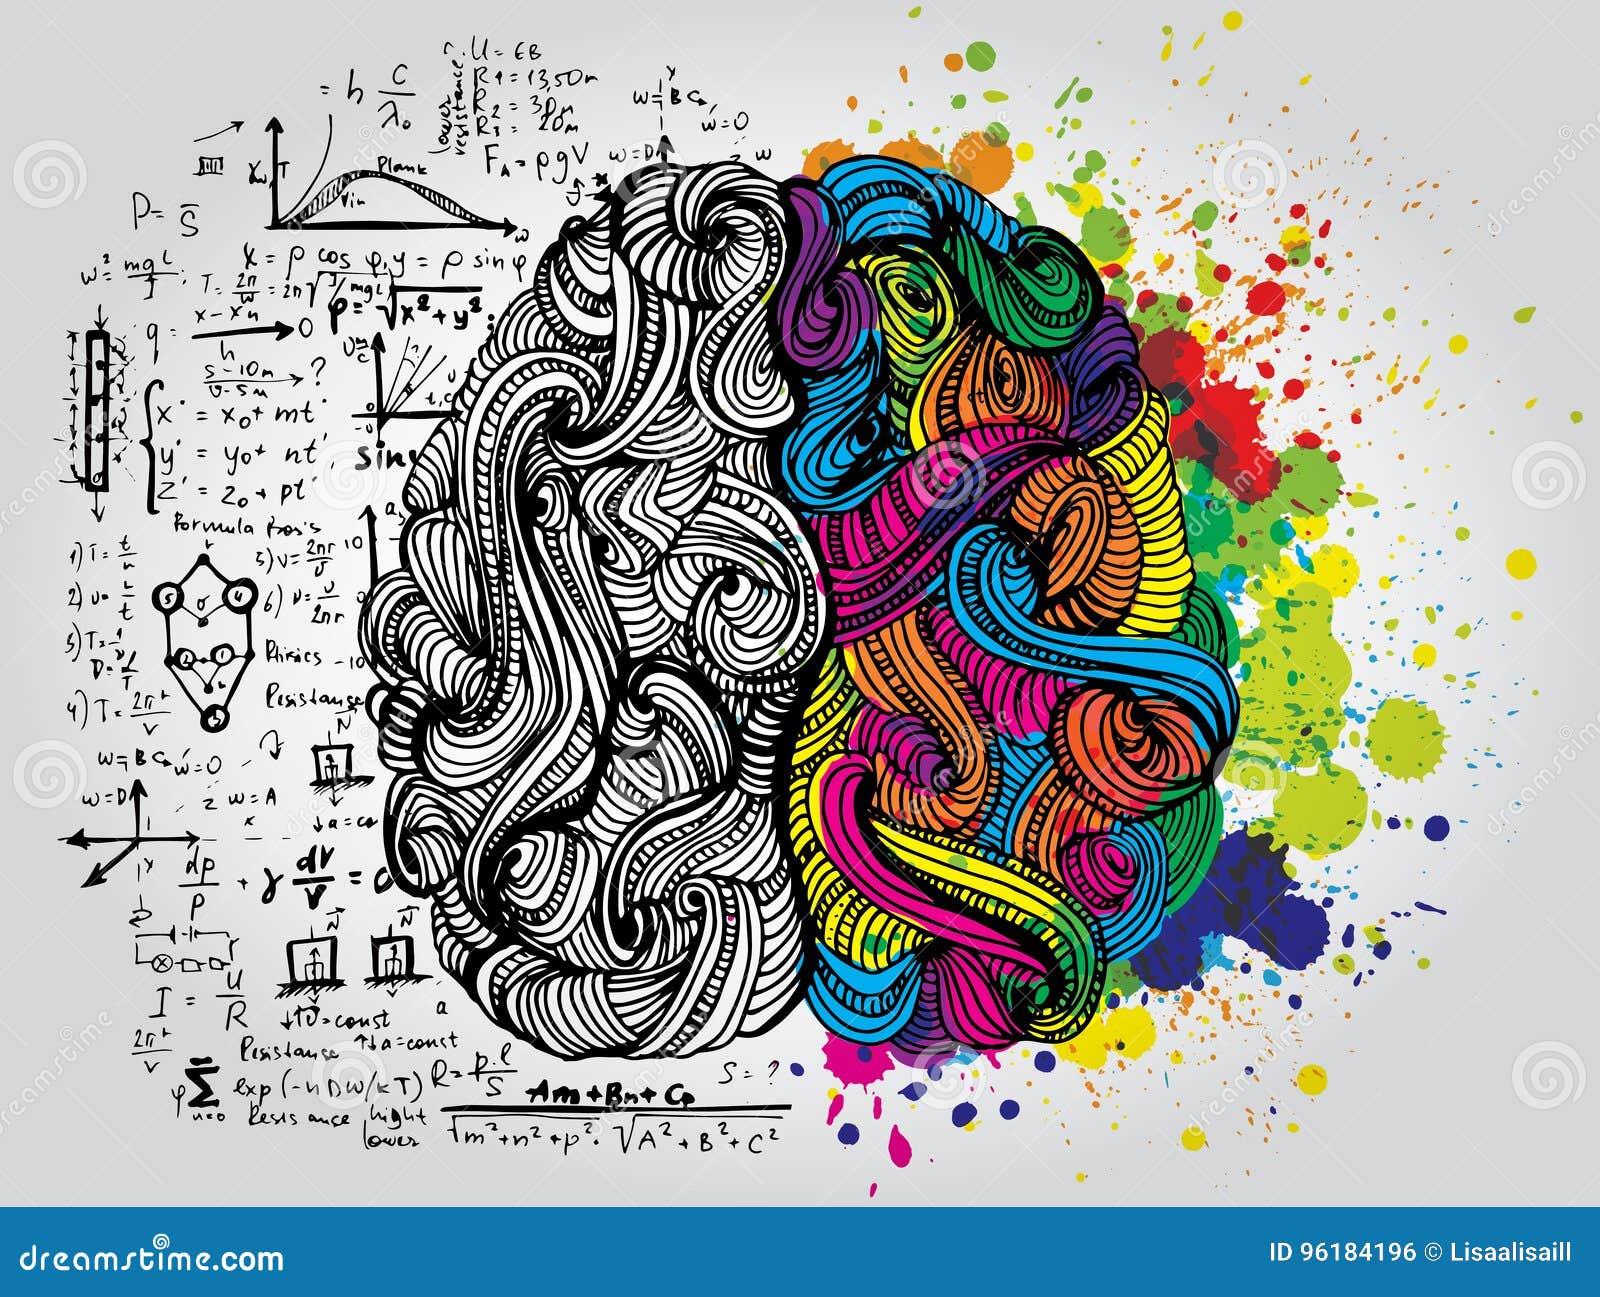 Left and right human brain. Creative half and logic half of human mind. Vector illustration.